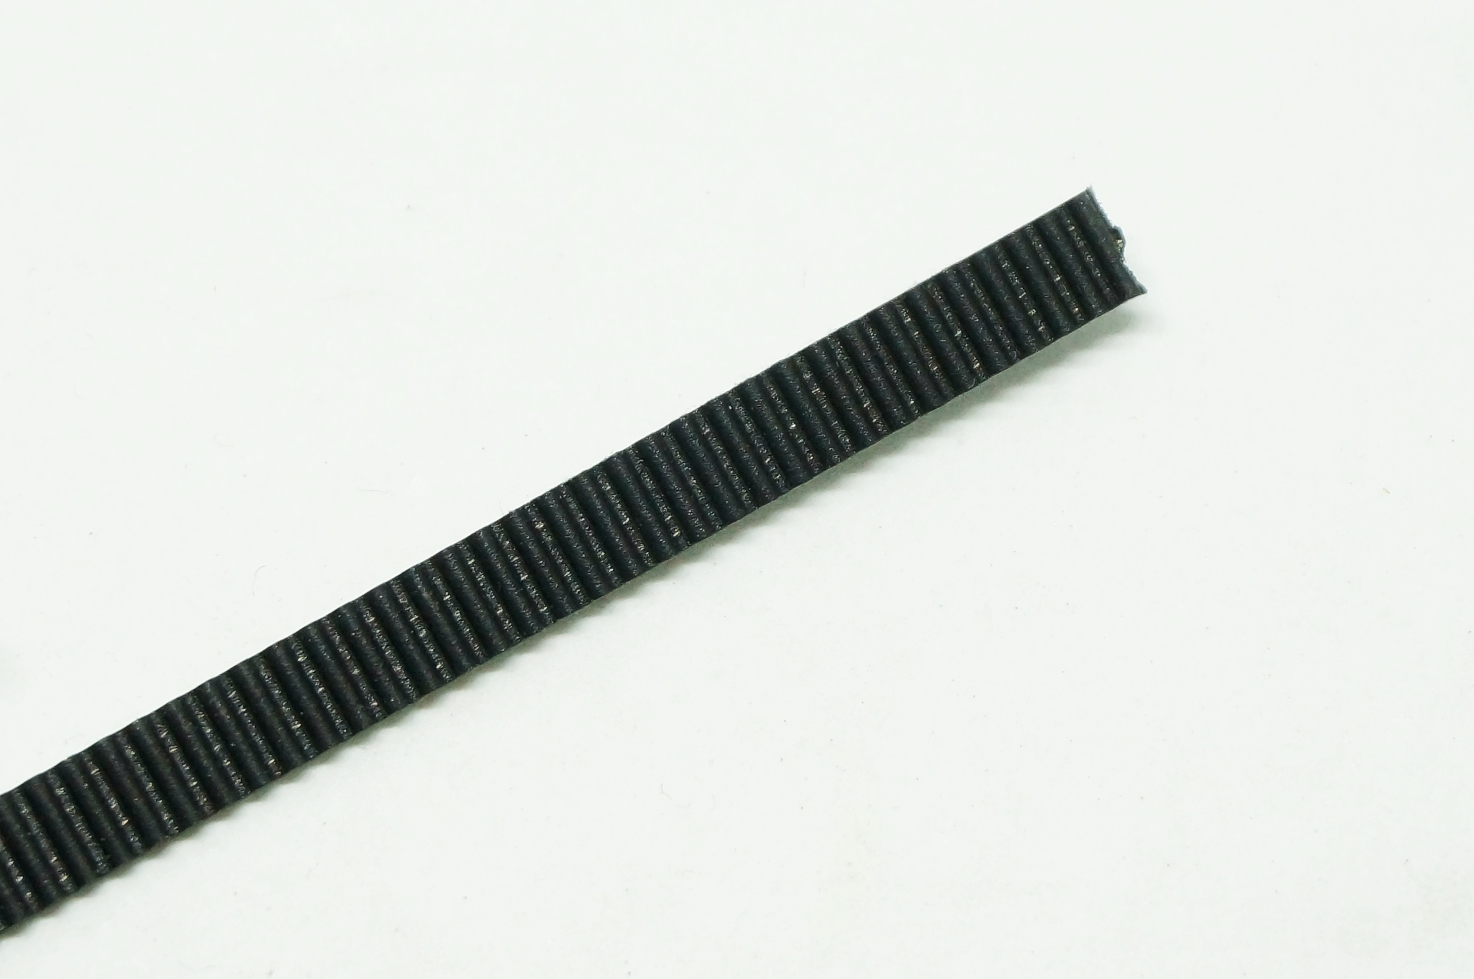 Steel core timing belt width 6mm สีดำ (เมตรละ 75 บาท)